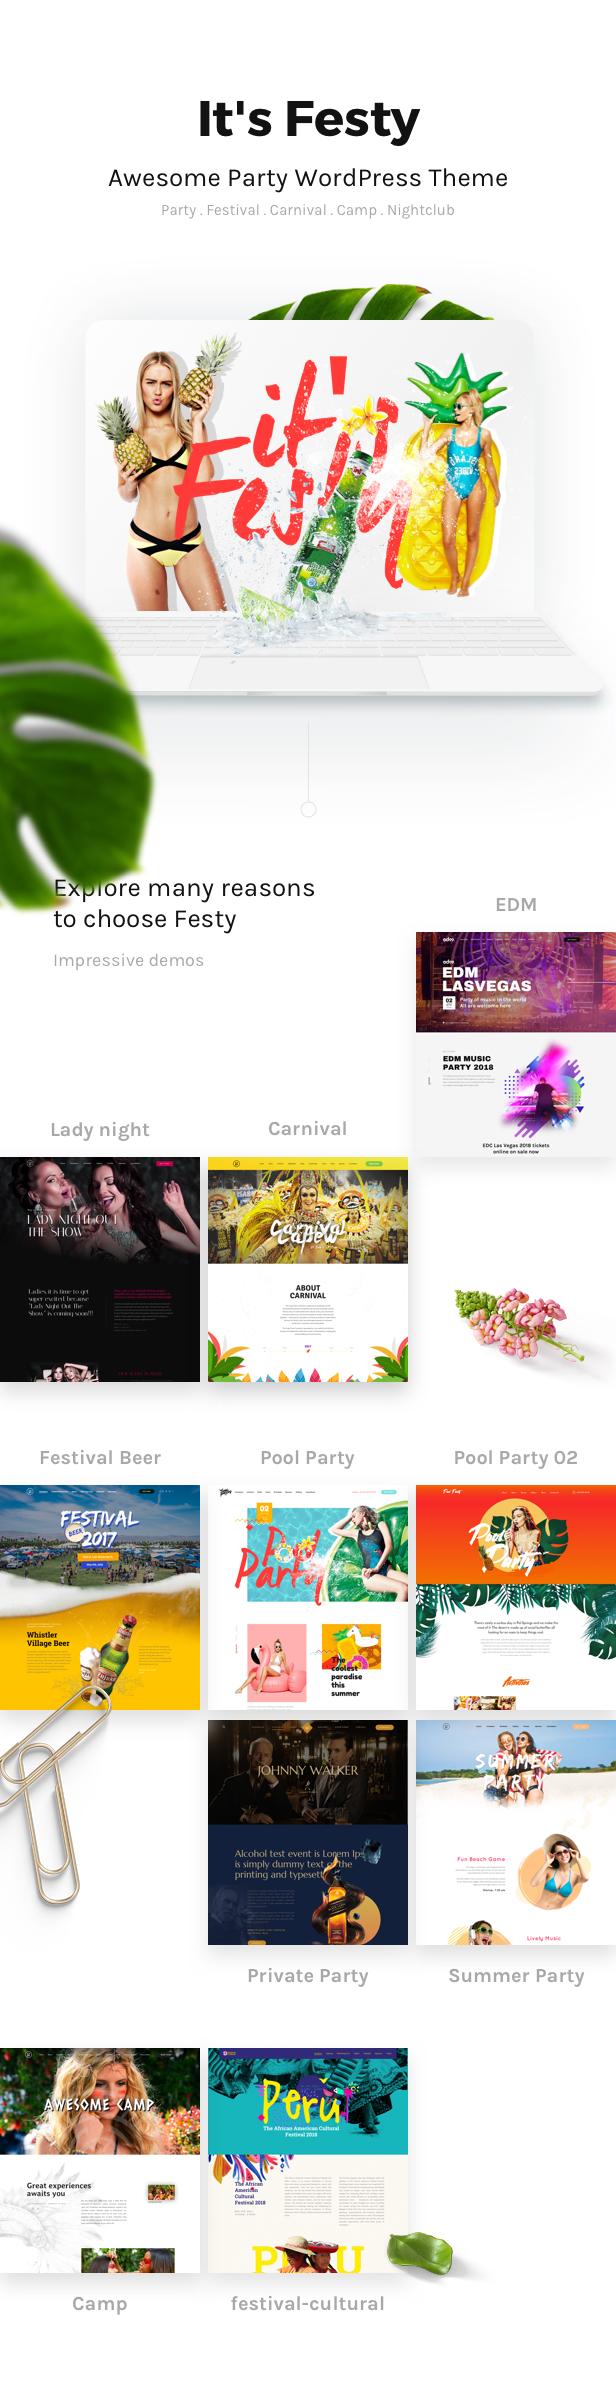 Demo Festy WordPress Theme